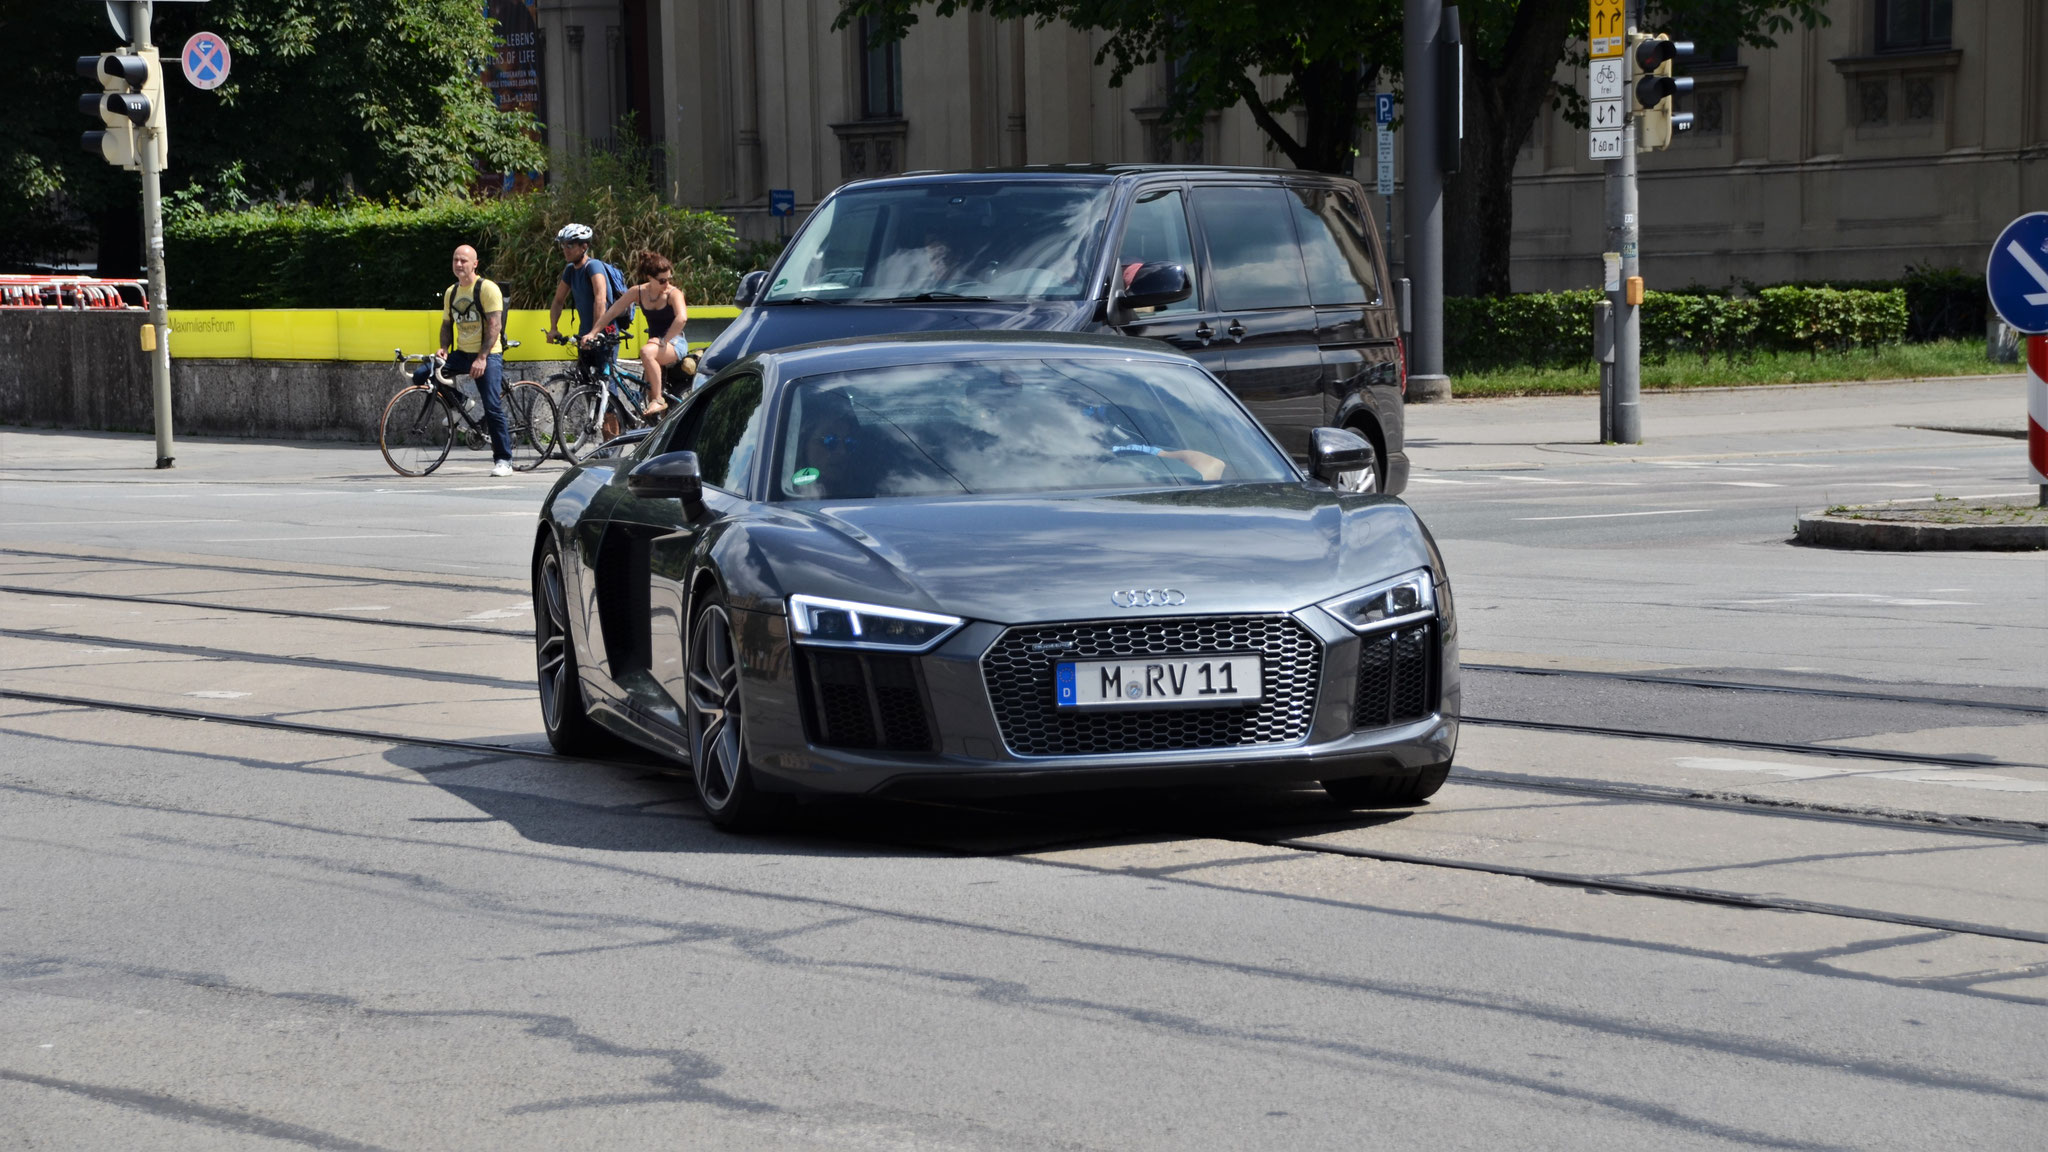 Audi R8 V10 - M-RV-11